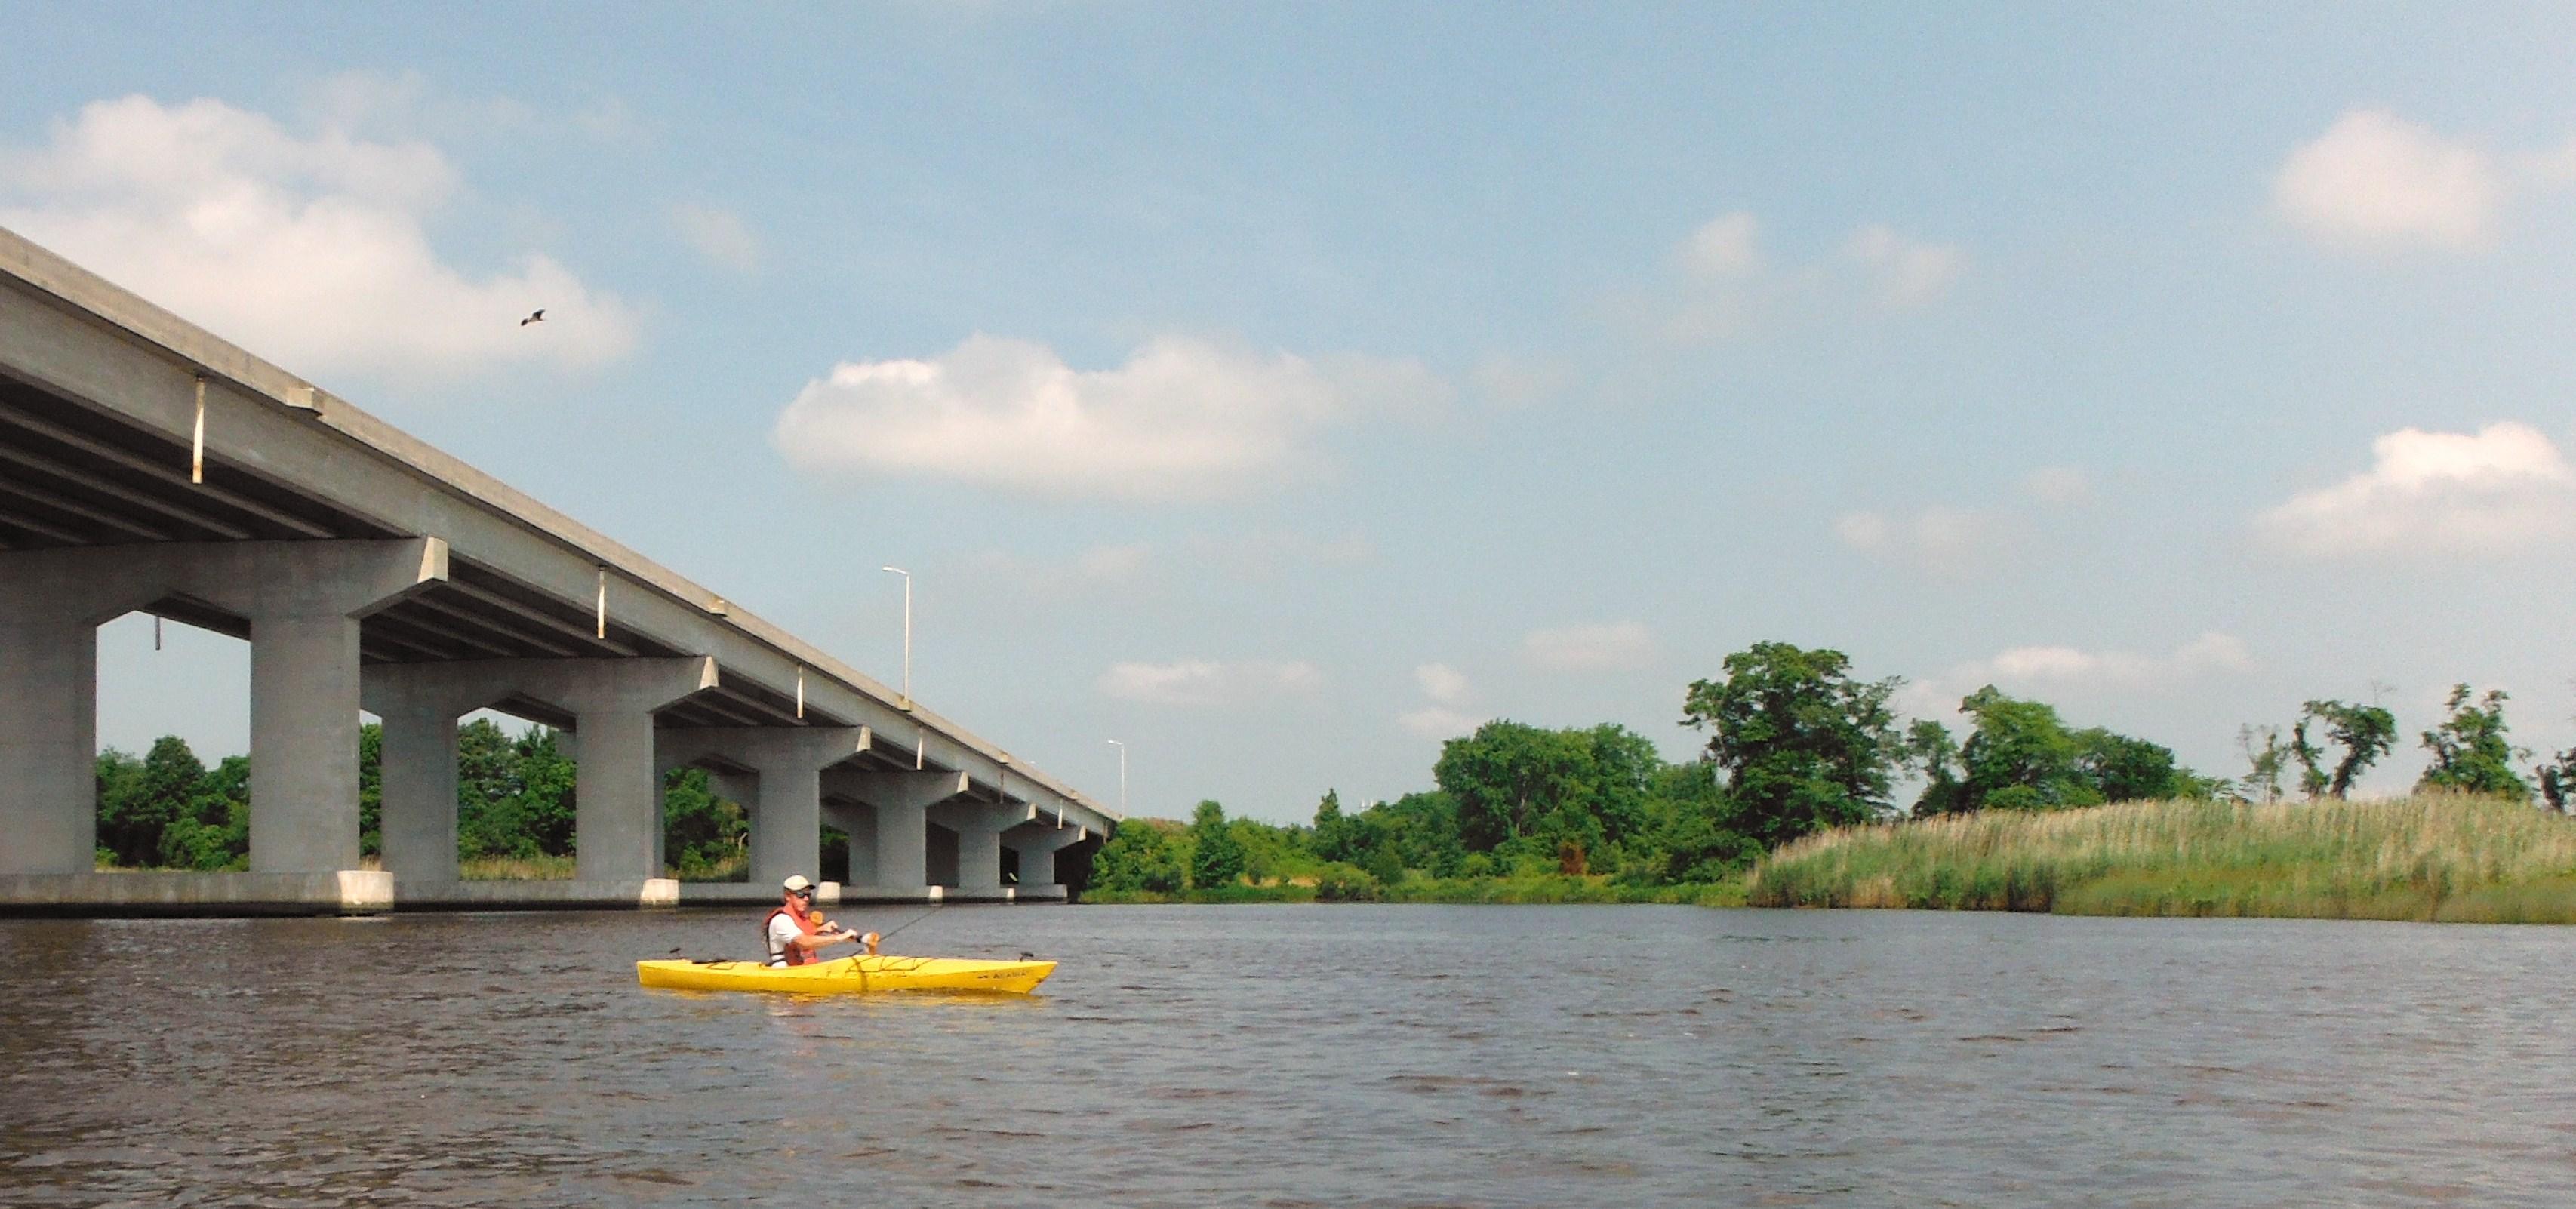 Kayaking under the Rt. 50 bridge outside of Vienna, MD.